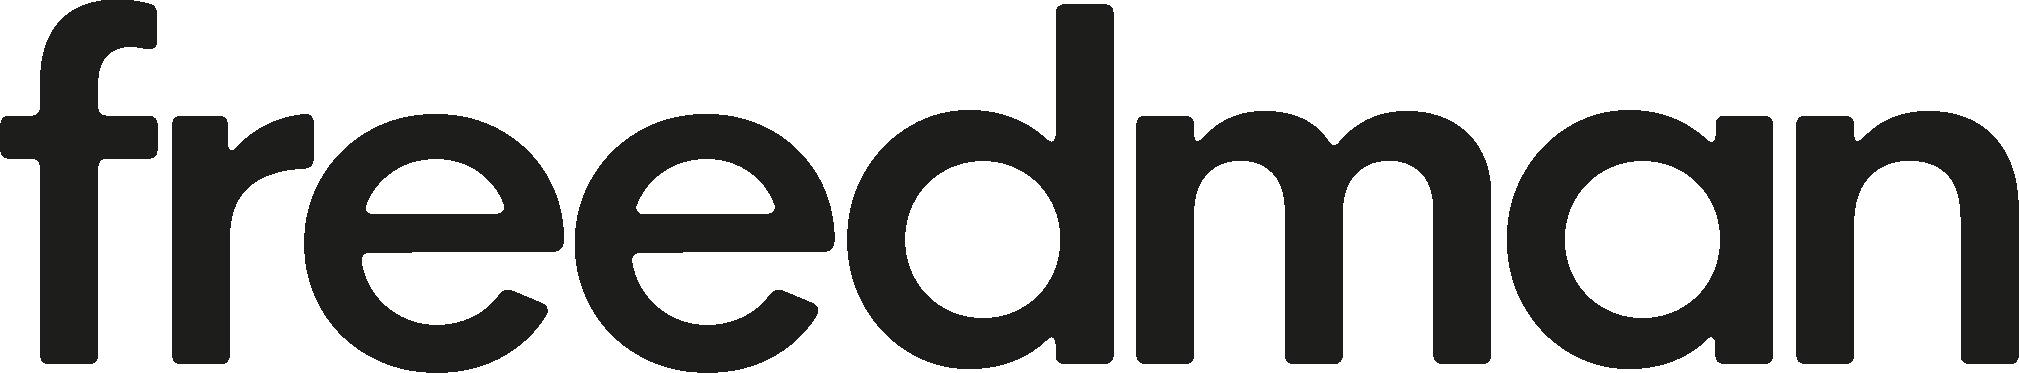 freedman_logo_final.png